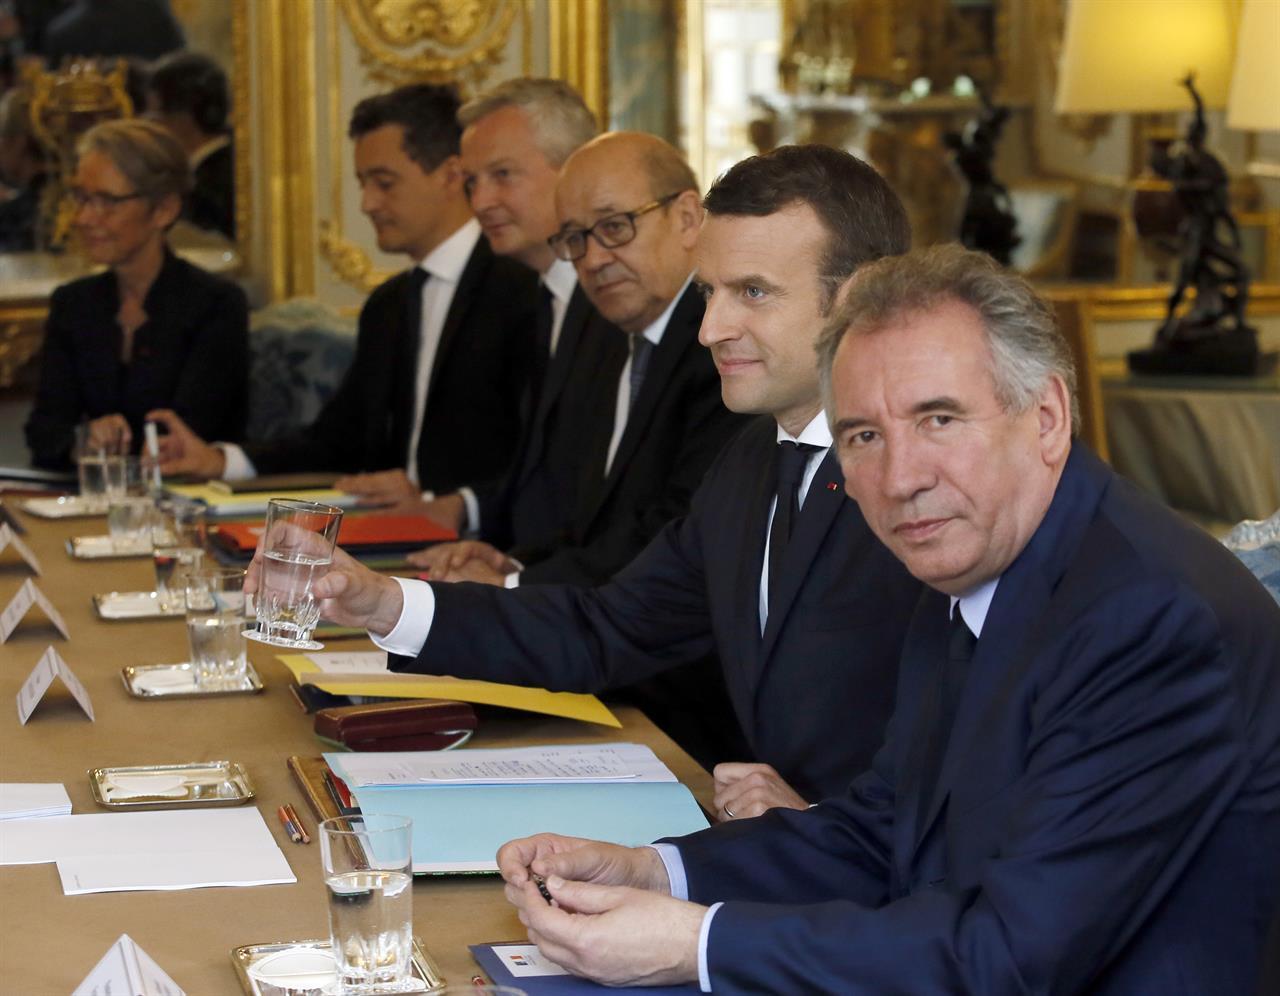 French President Macron talks to Putin, faces media uproar ...